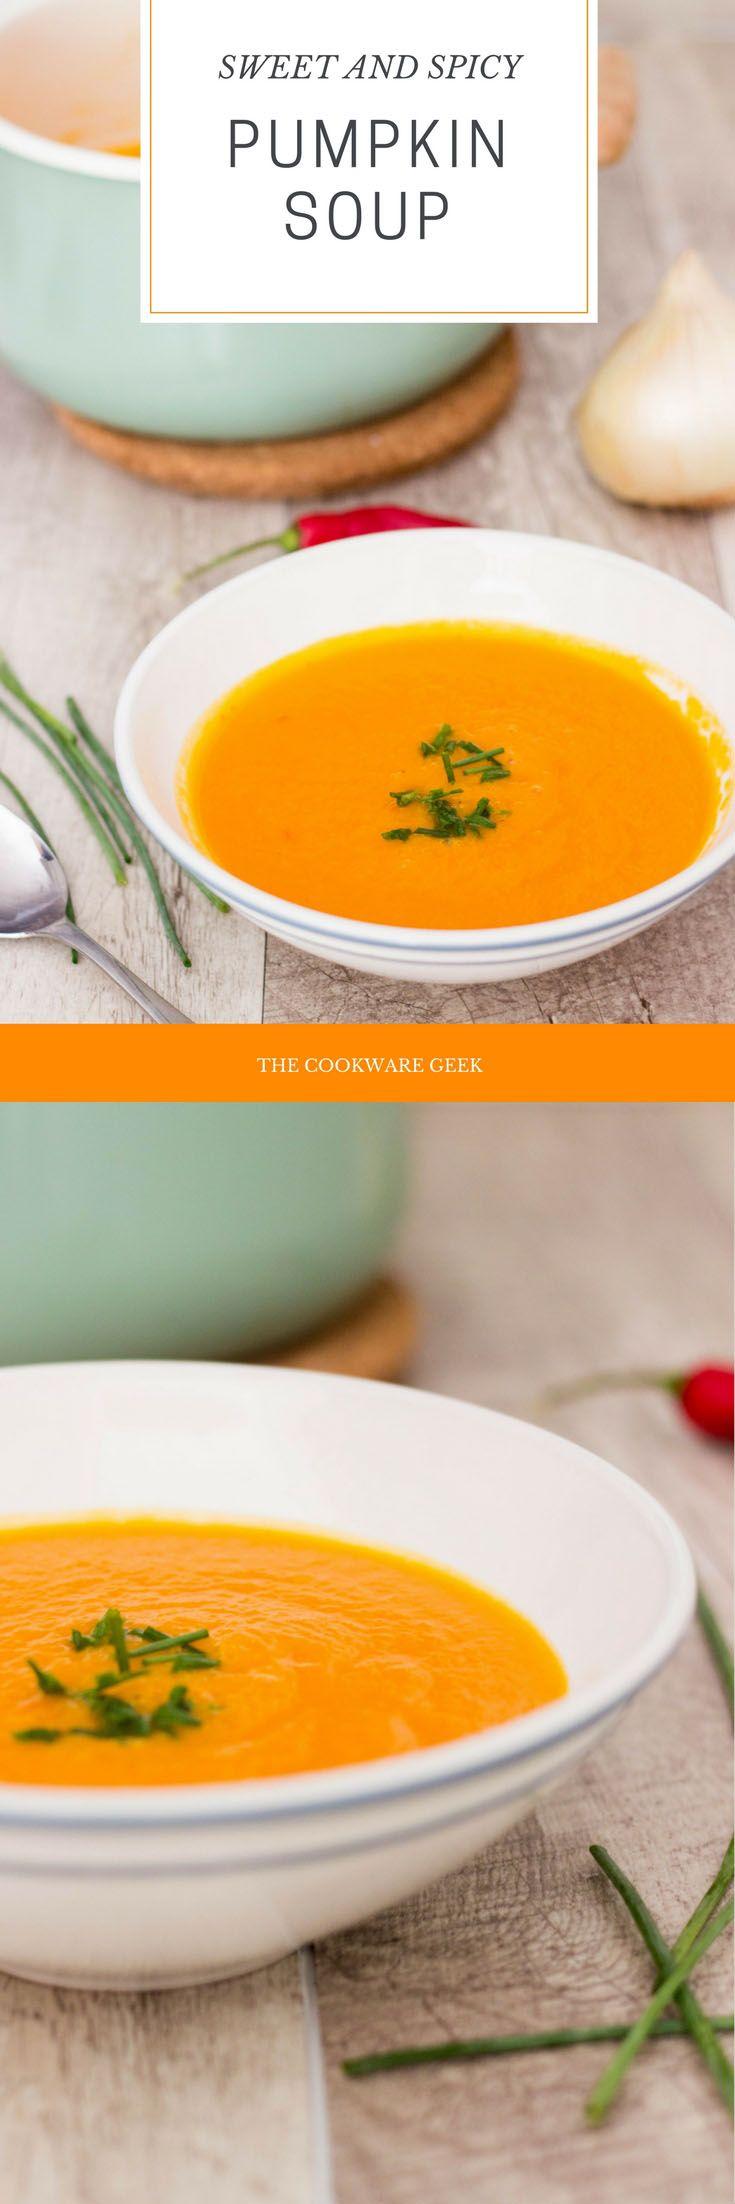 Sweet and Spicy Pumpkin Soup - The Cookware Geek | The Cookware Geek